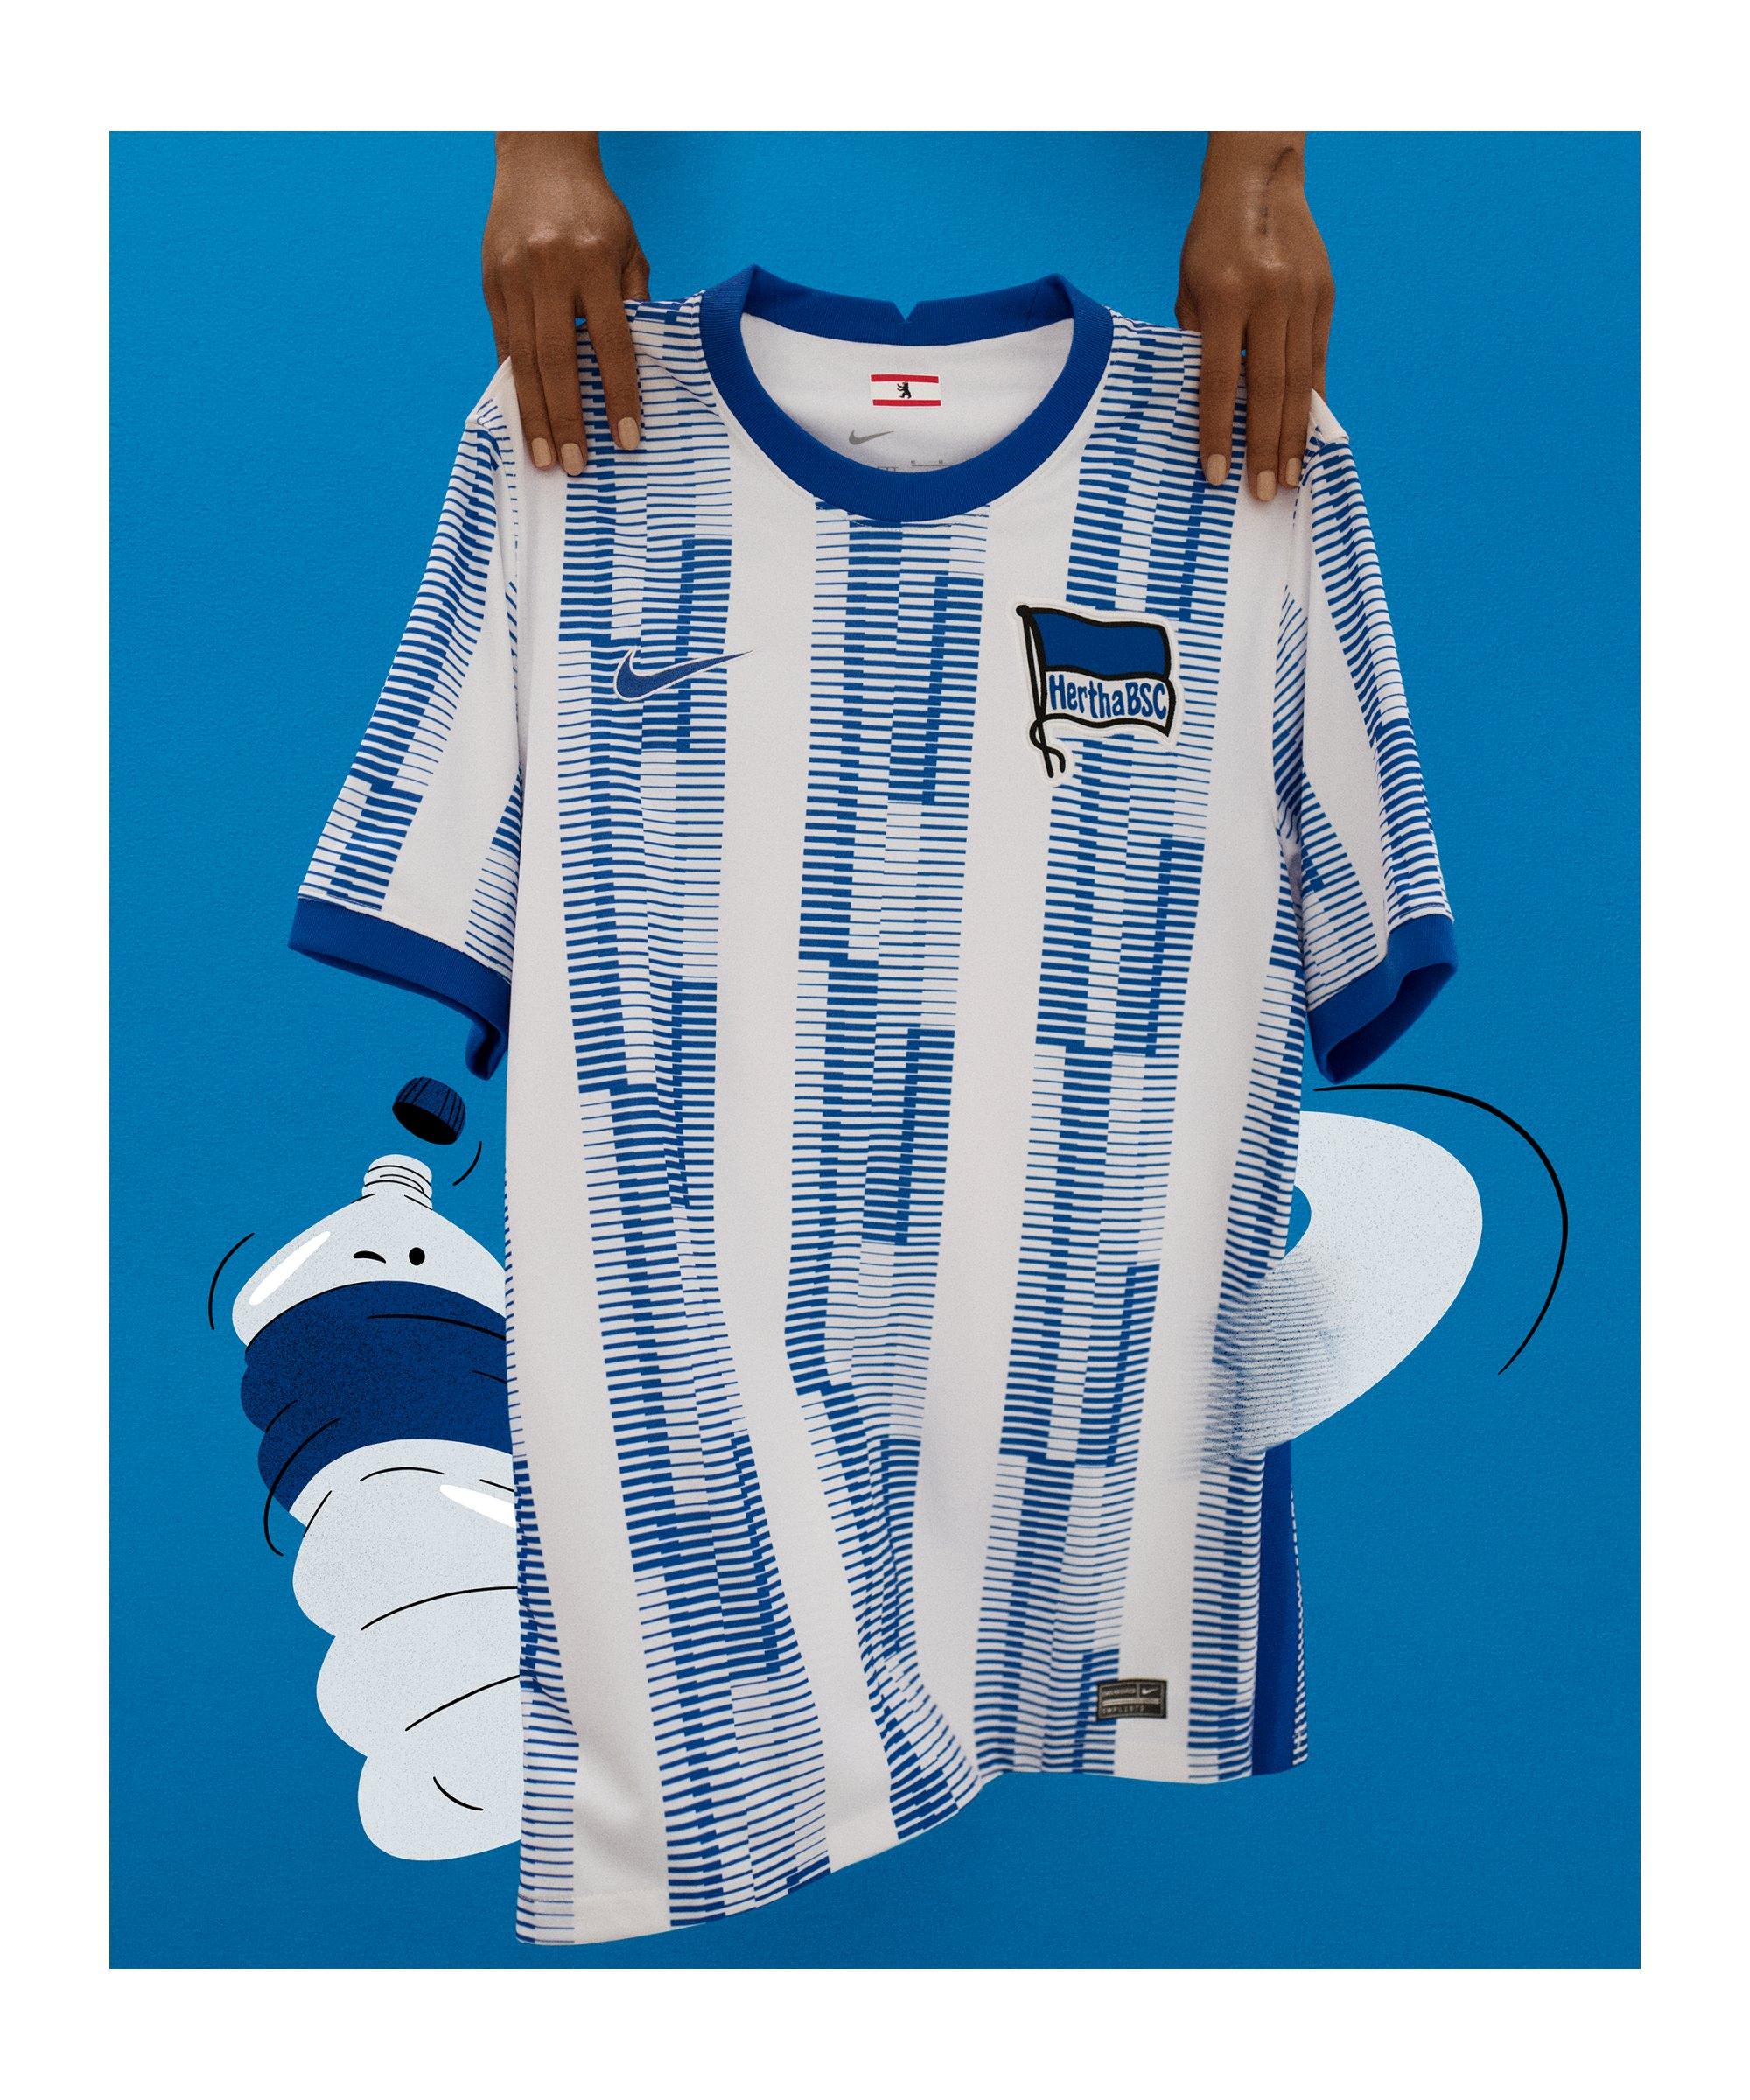 Nike Hertha BSC Trikot Home 2021/2022 Kids F101 - weiss